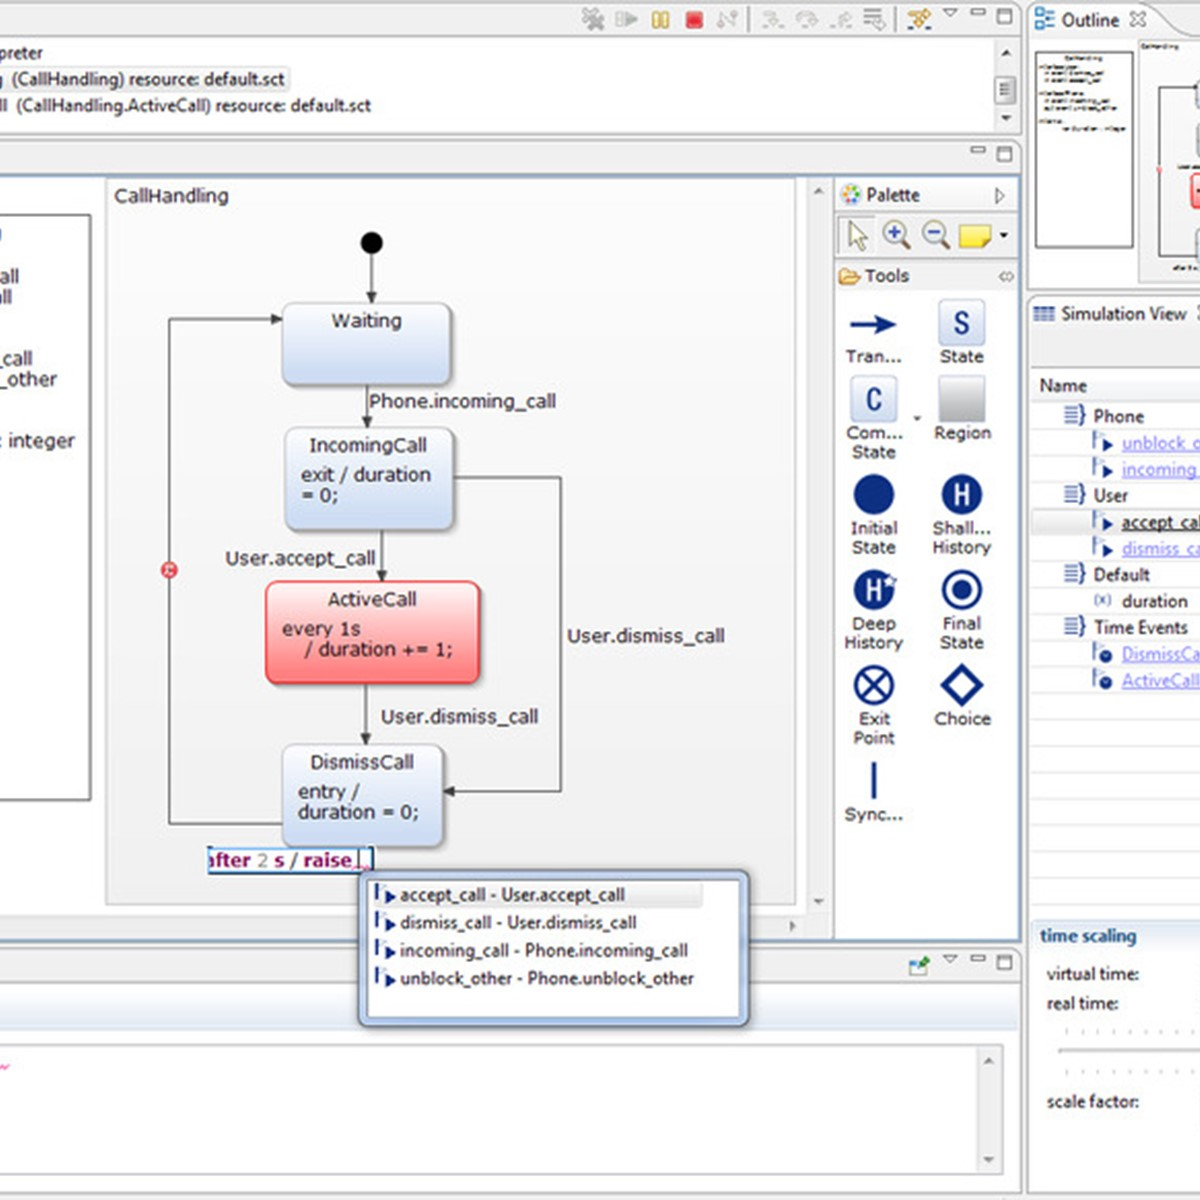 Yakindu Statechart Tools Alternatives and Similar Software